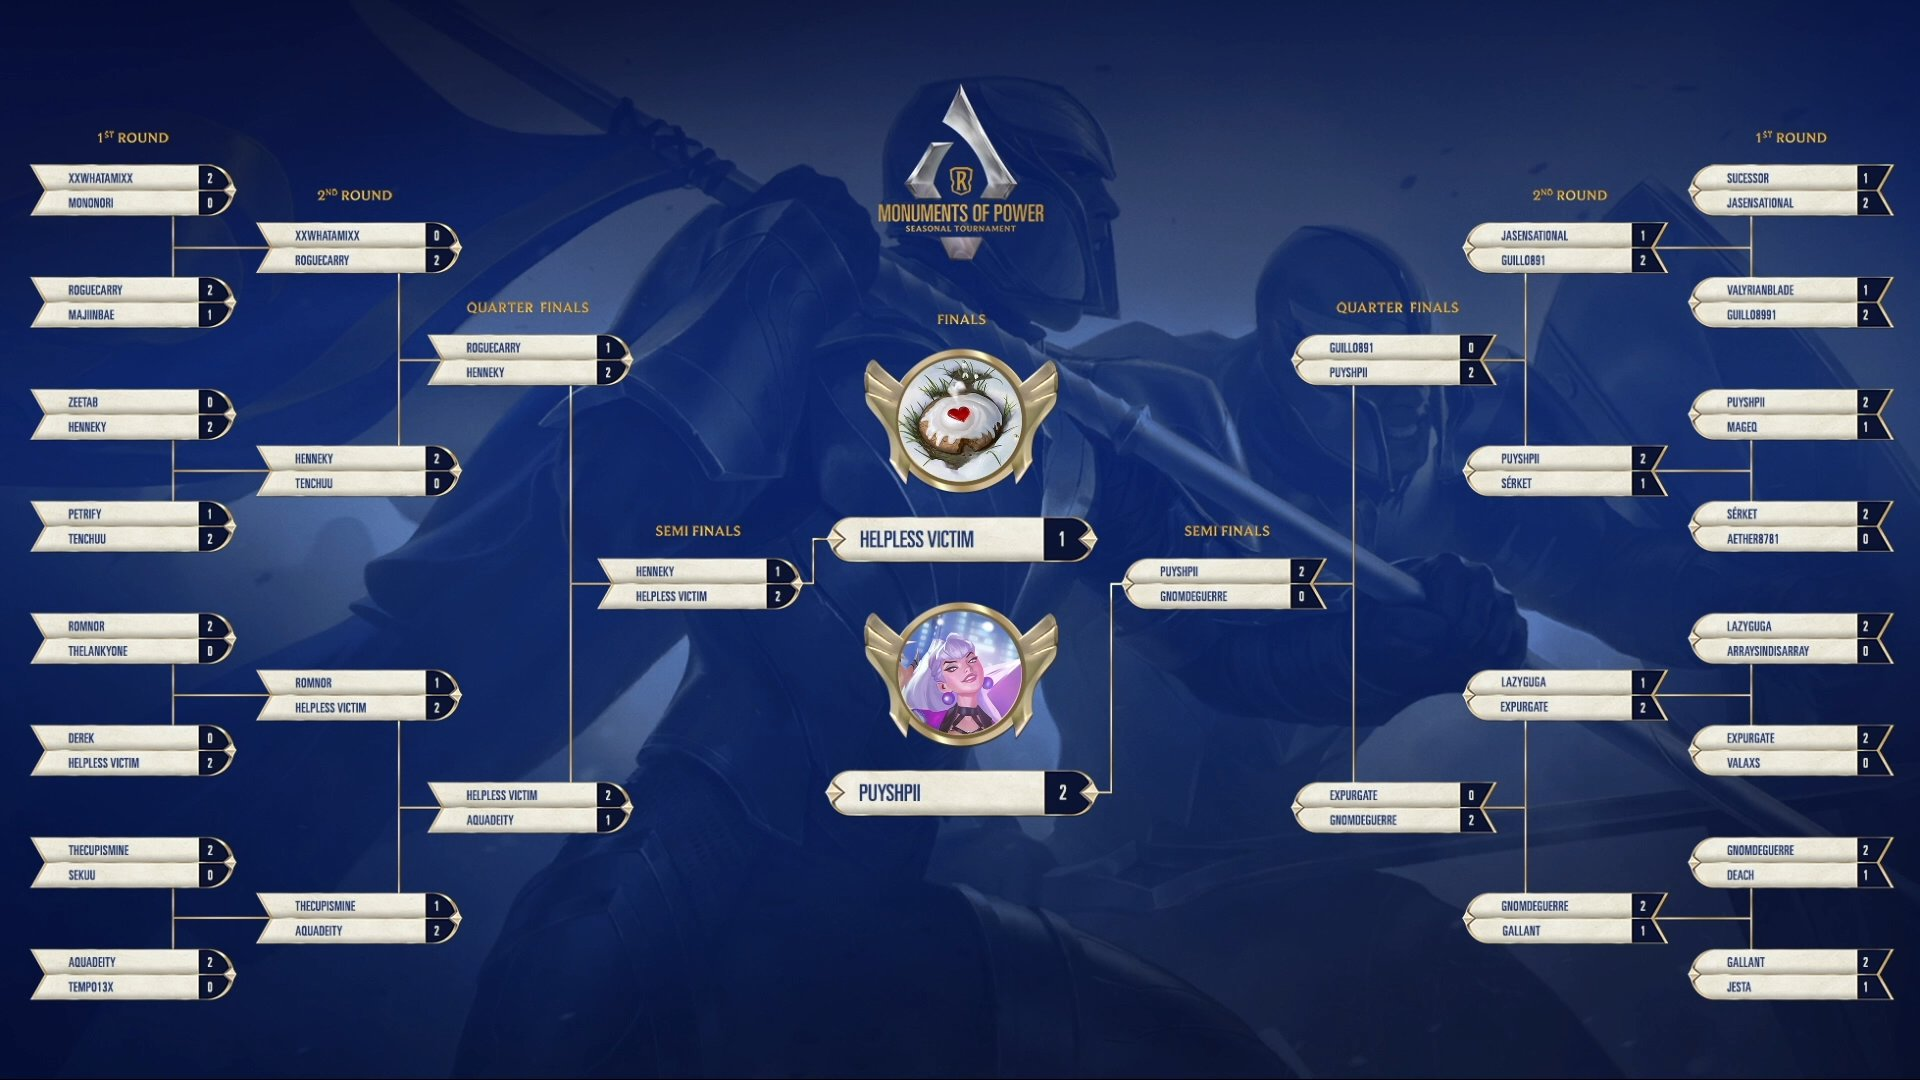 2020 Tournament Bracket